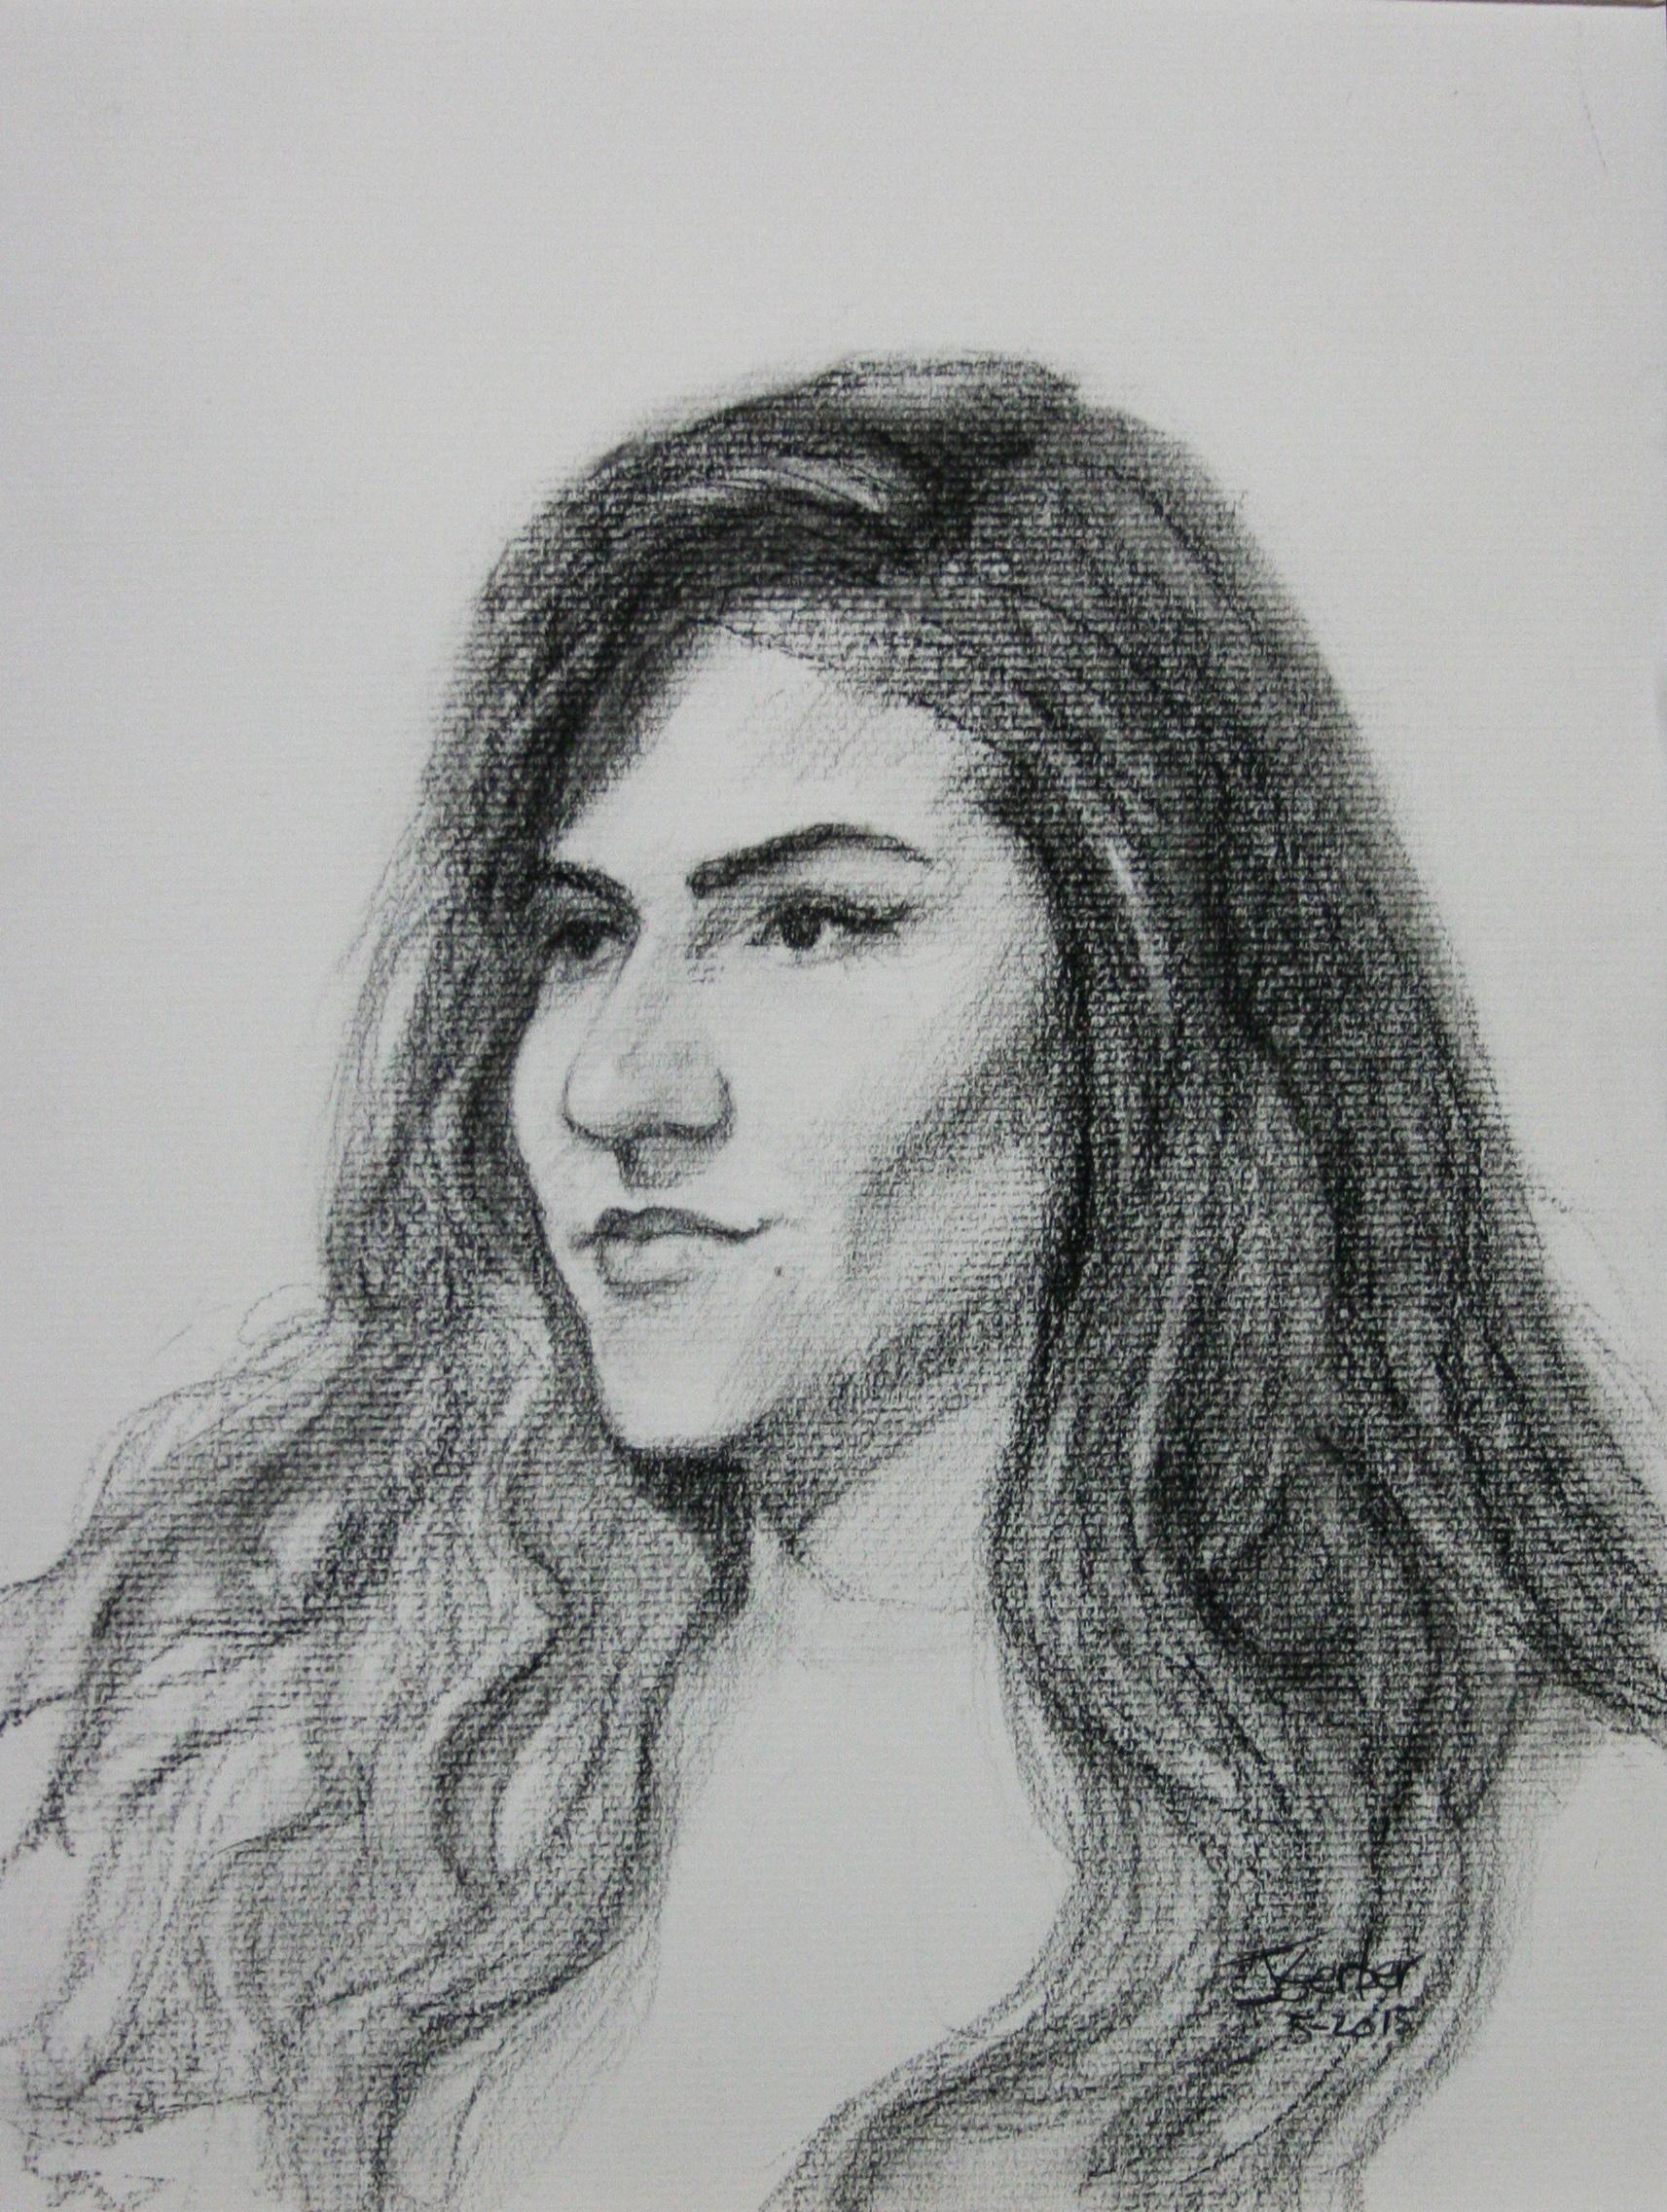 JIm Gerber did this 3-hour drawing.